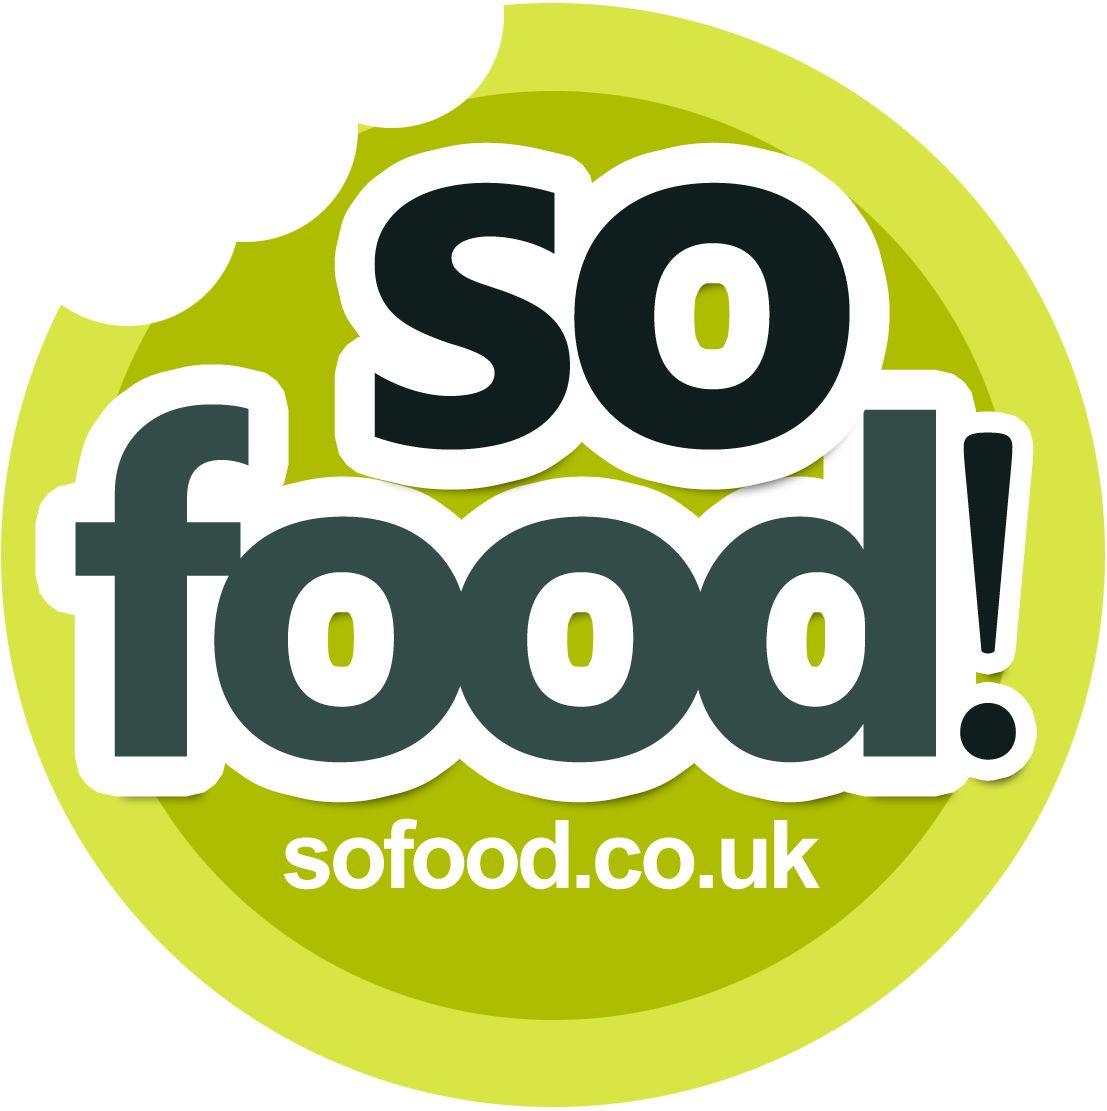 Sofood! Ltd